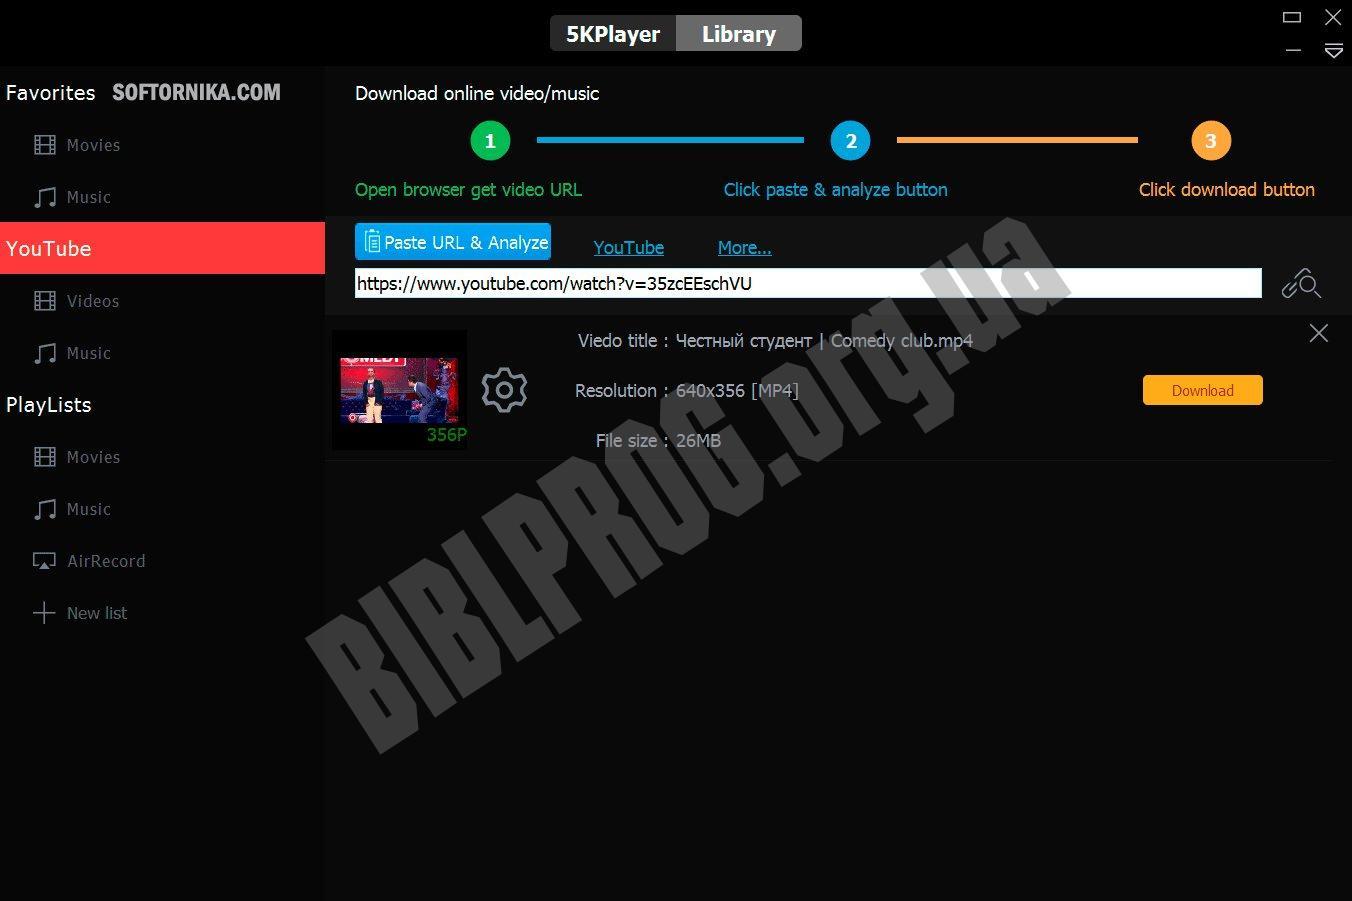 Скриншот 5KPlayer